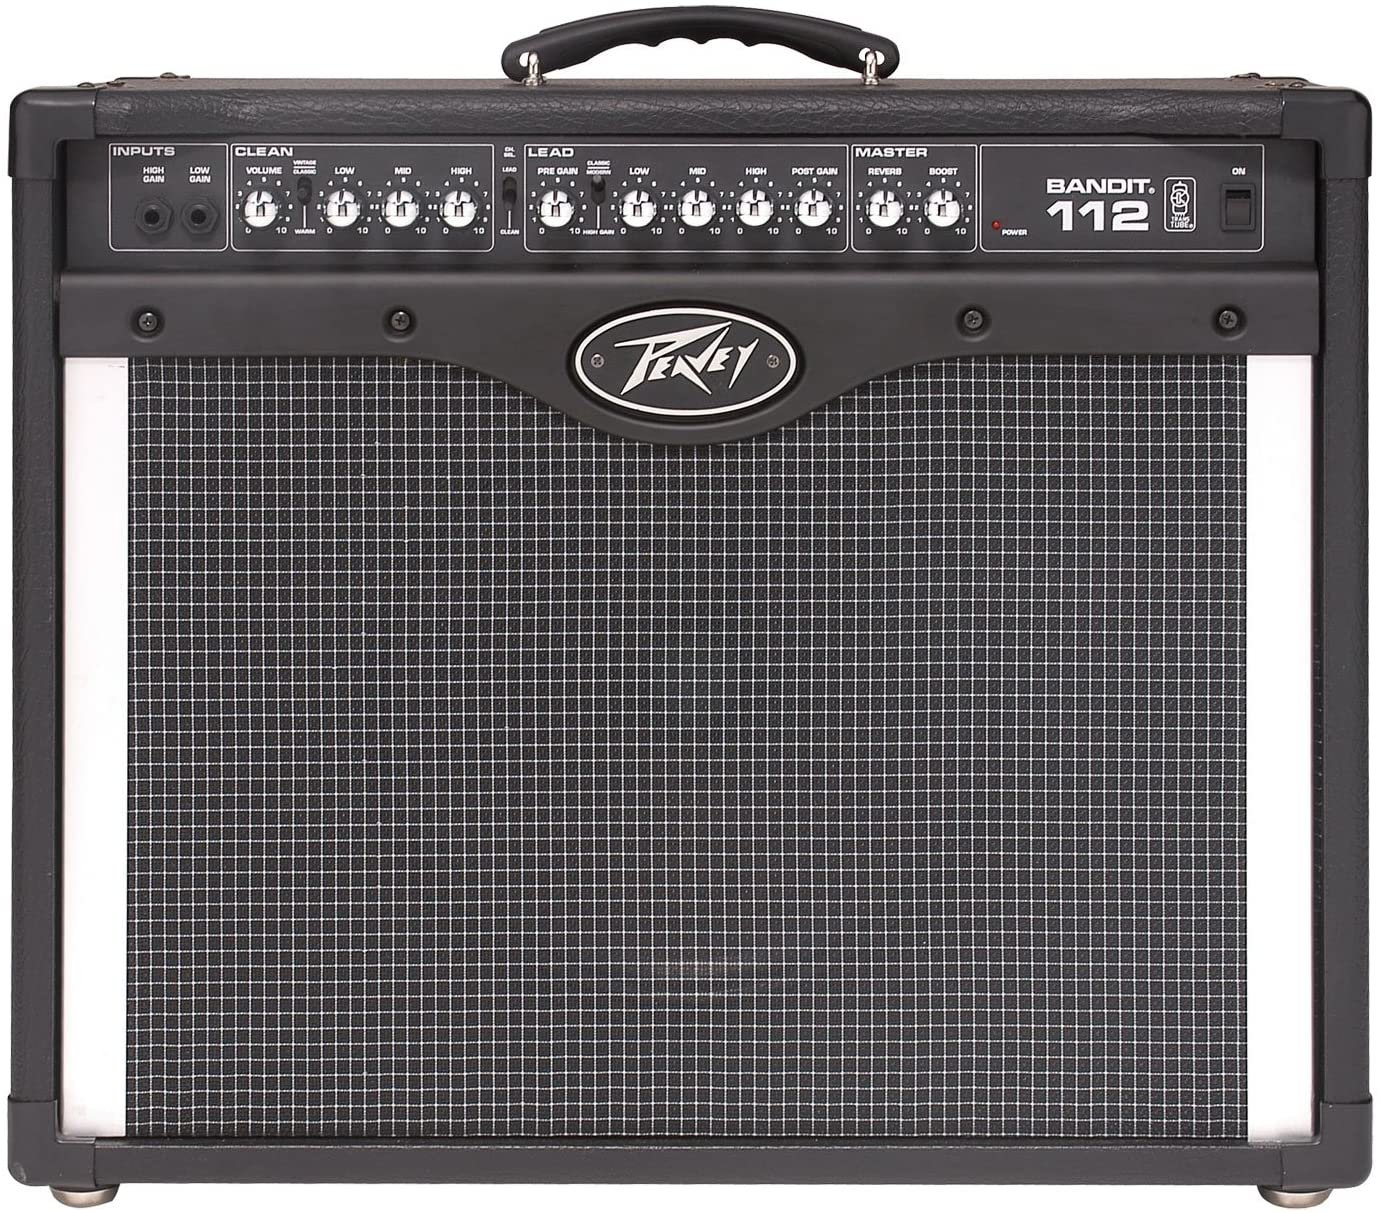 Peavey Bandit 112 Guitar Amplifier